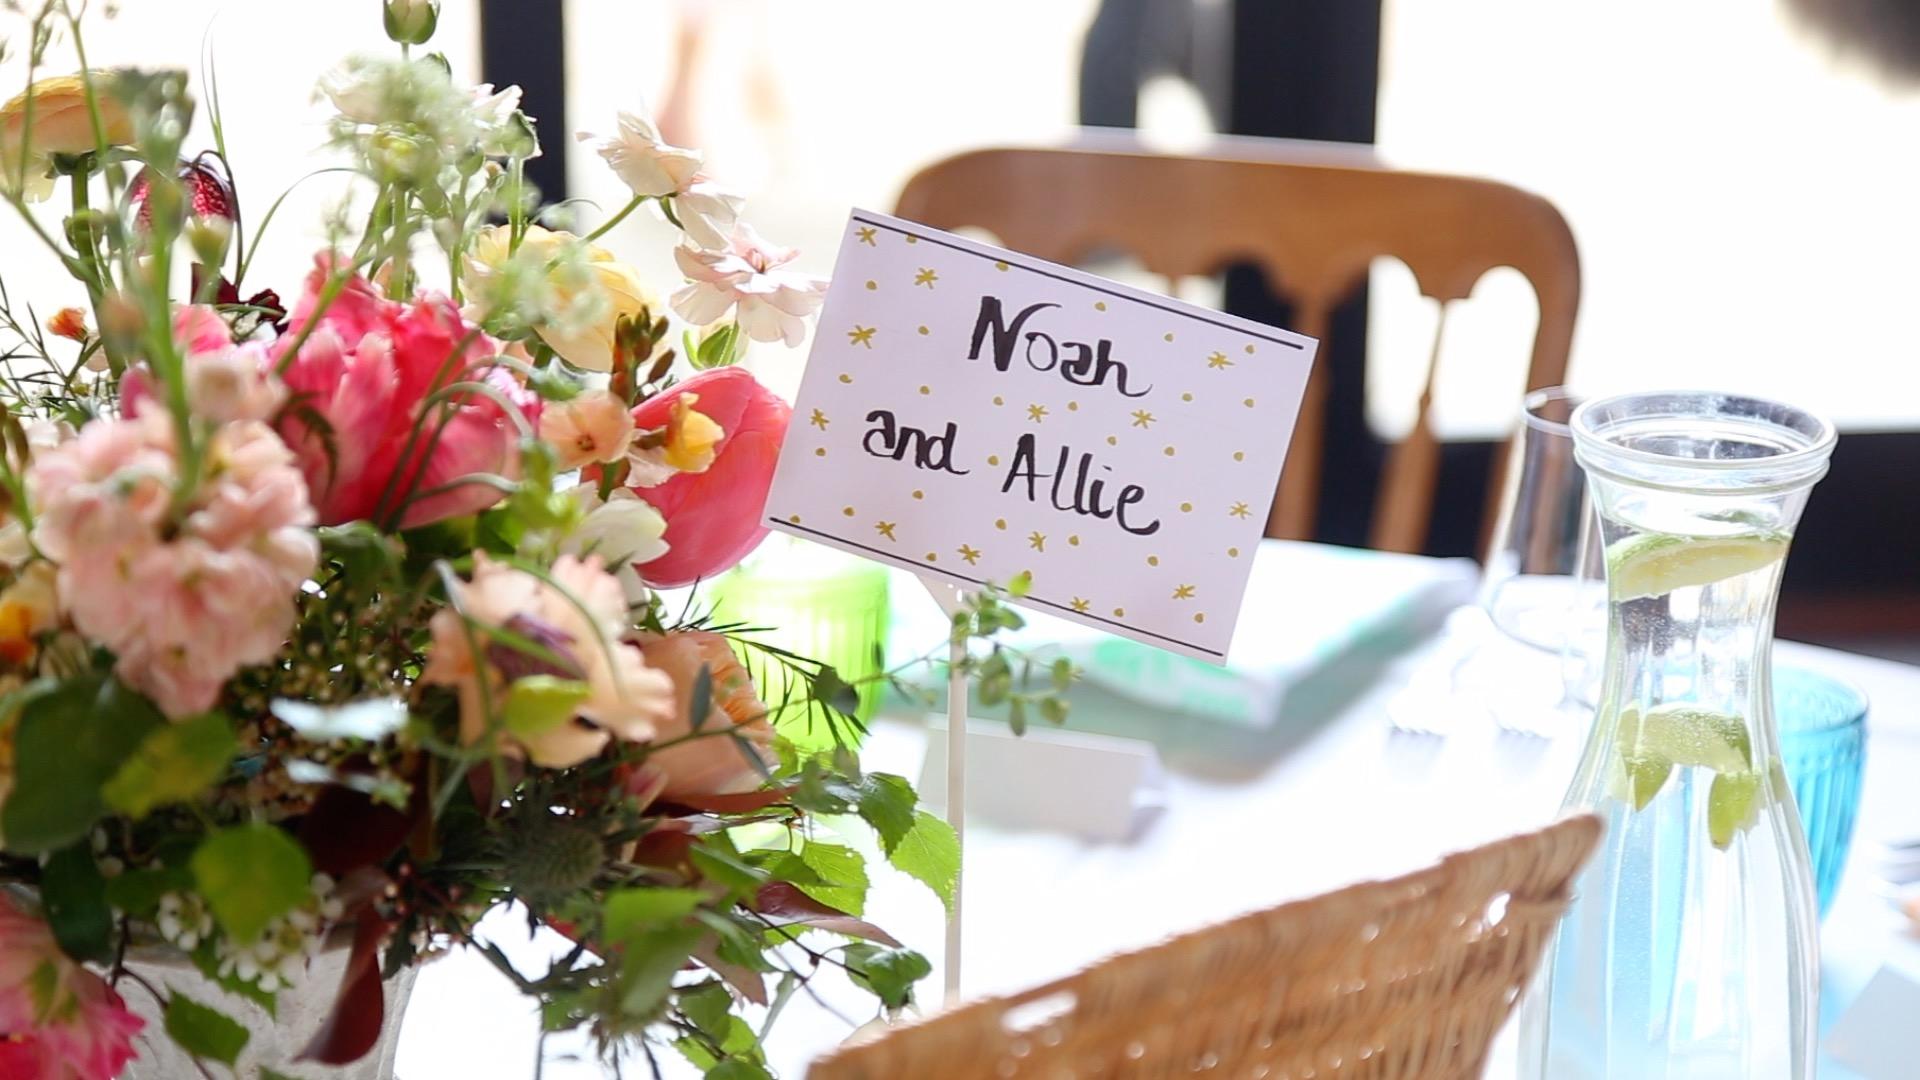 Molly & Jack - Full edit noah allie.jpg